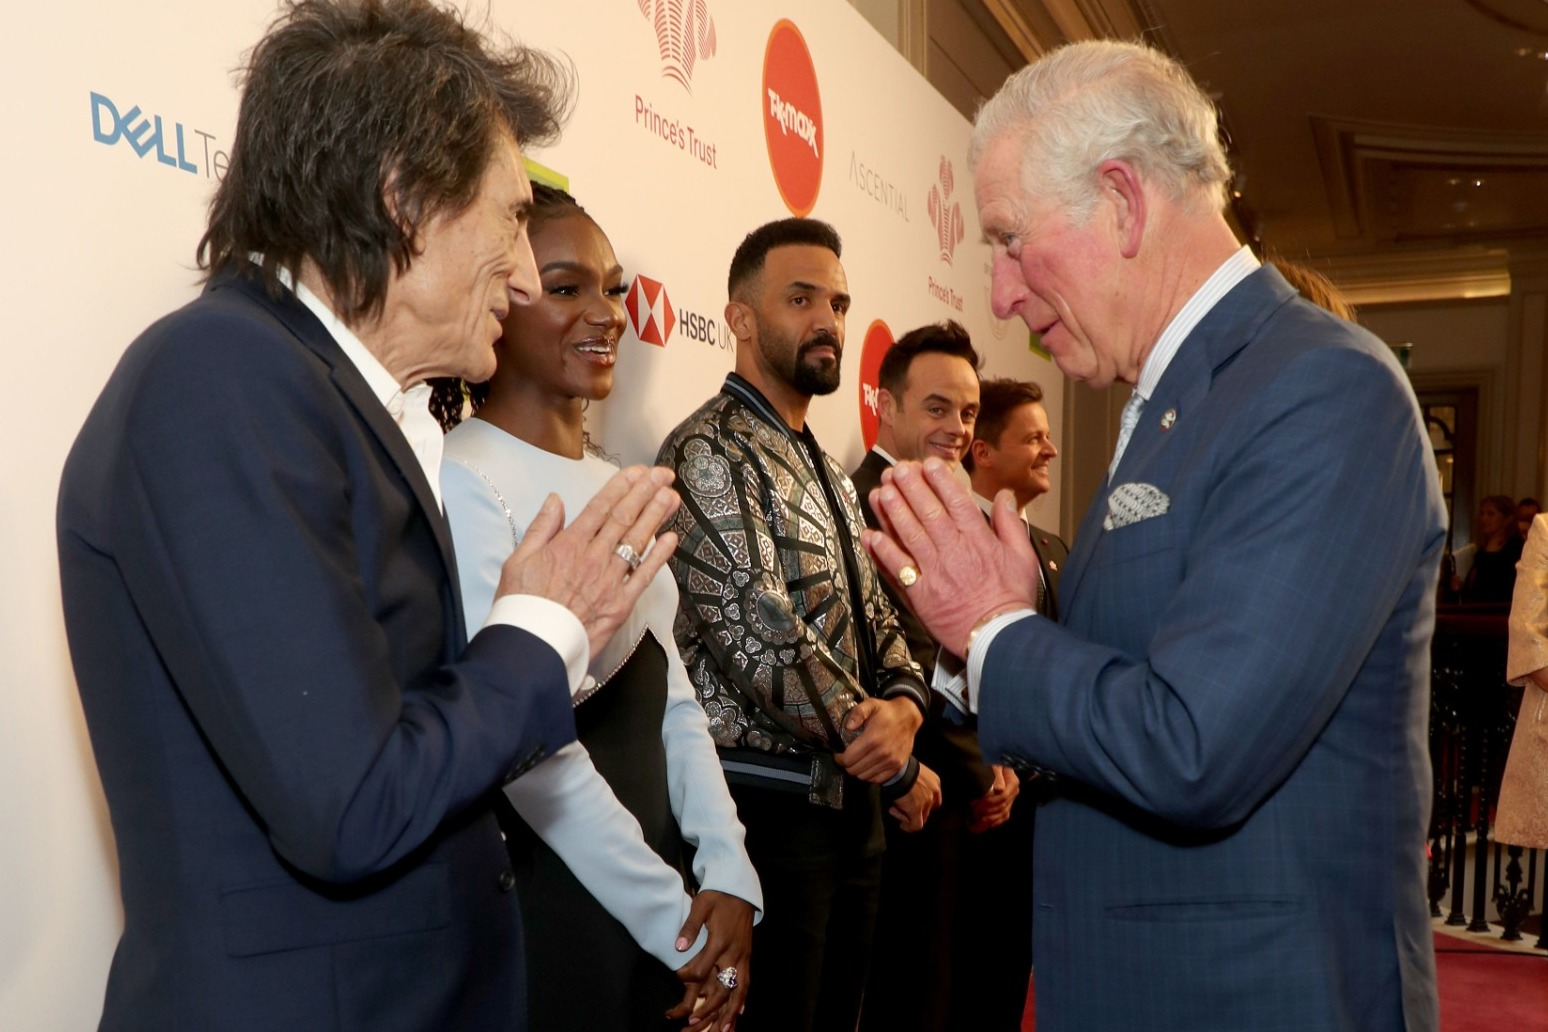 Prince of Wales test positive for \'mild symptoms\' of coronavirus